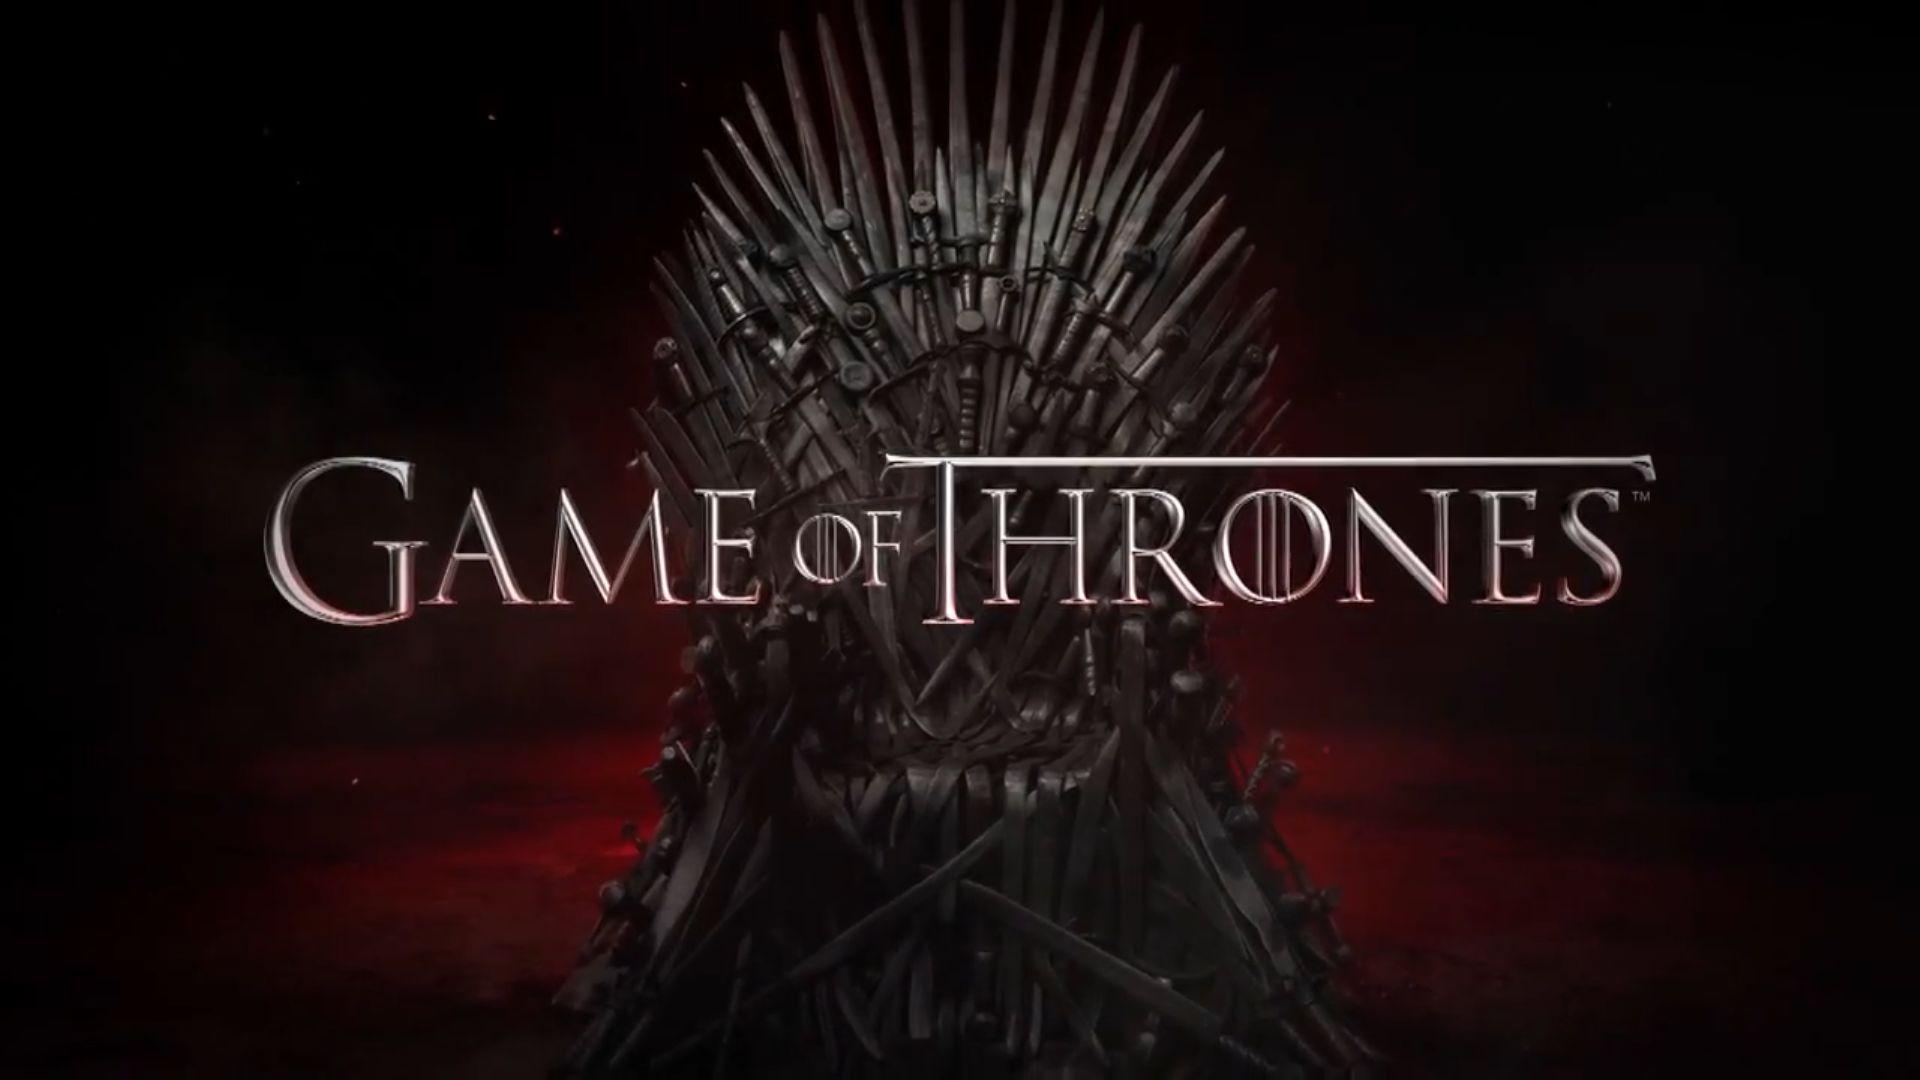 game-of-thrones-wallpaper-4.jpg